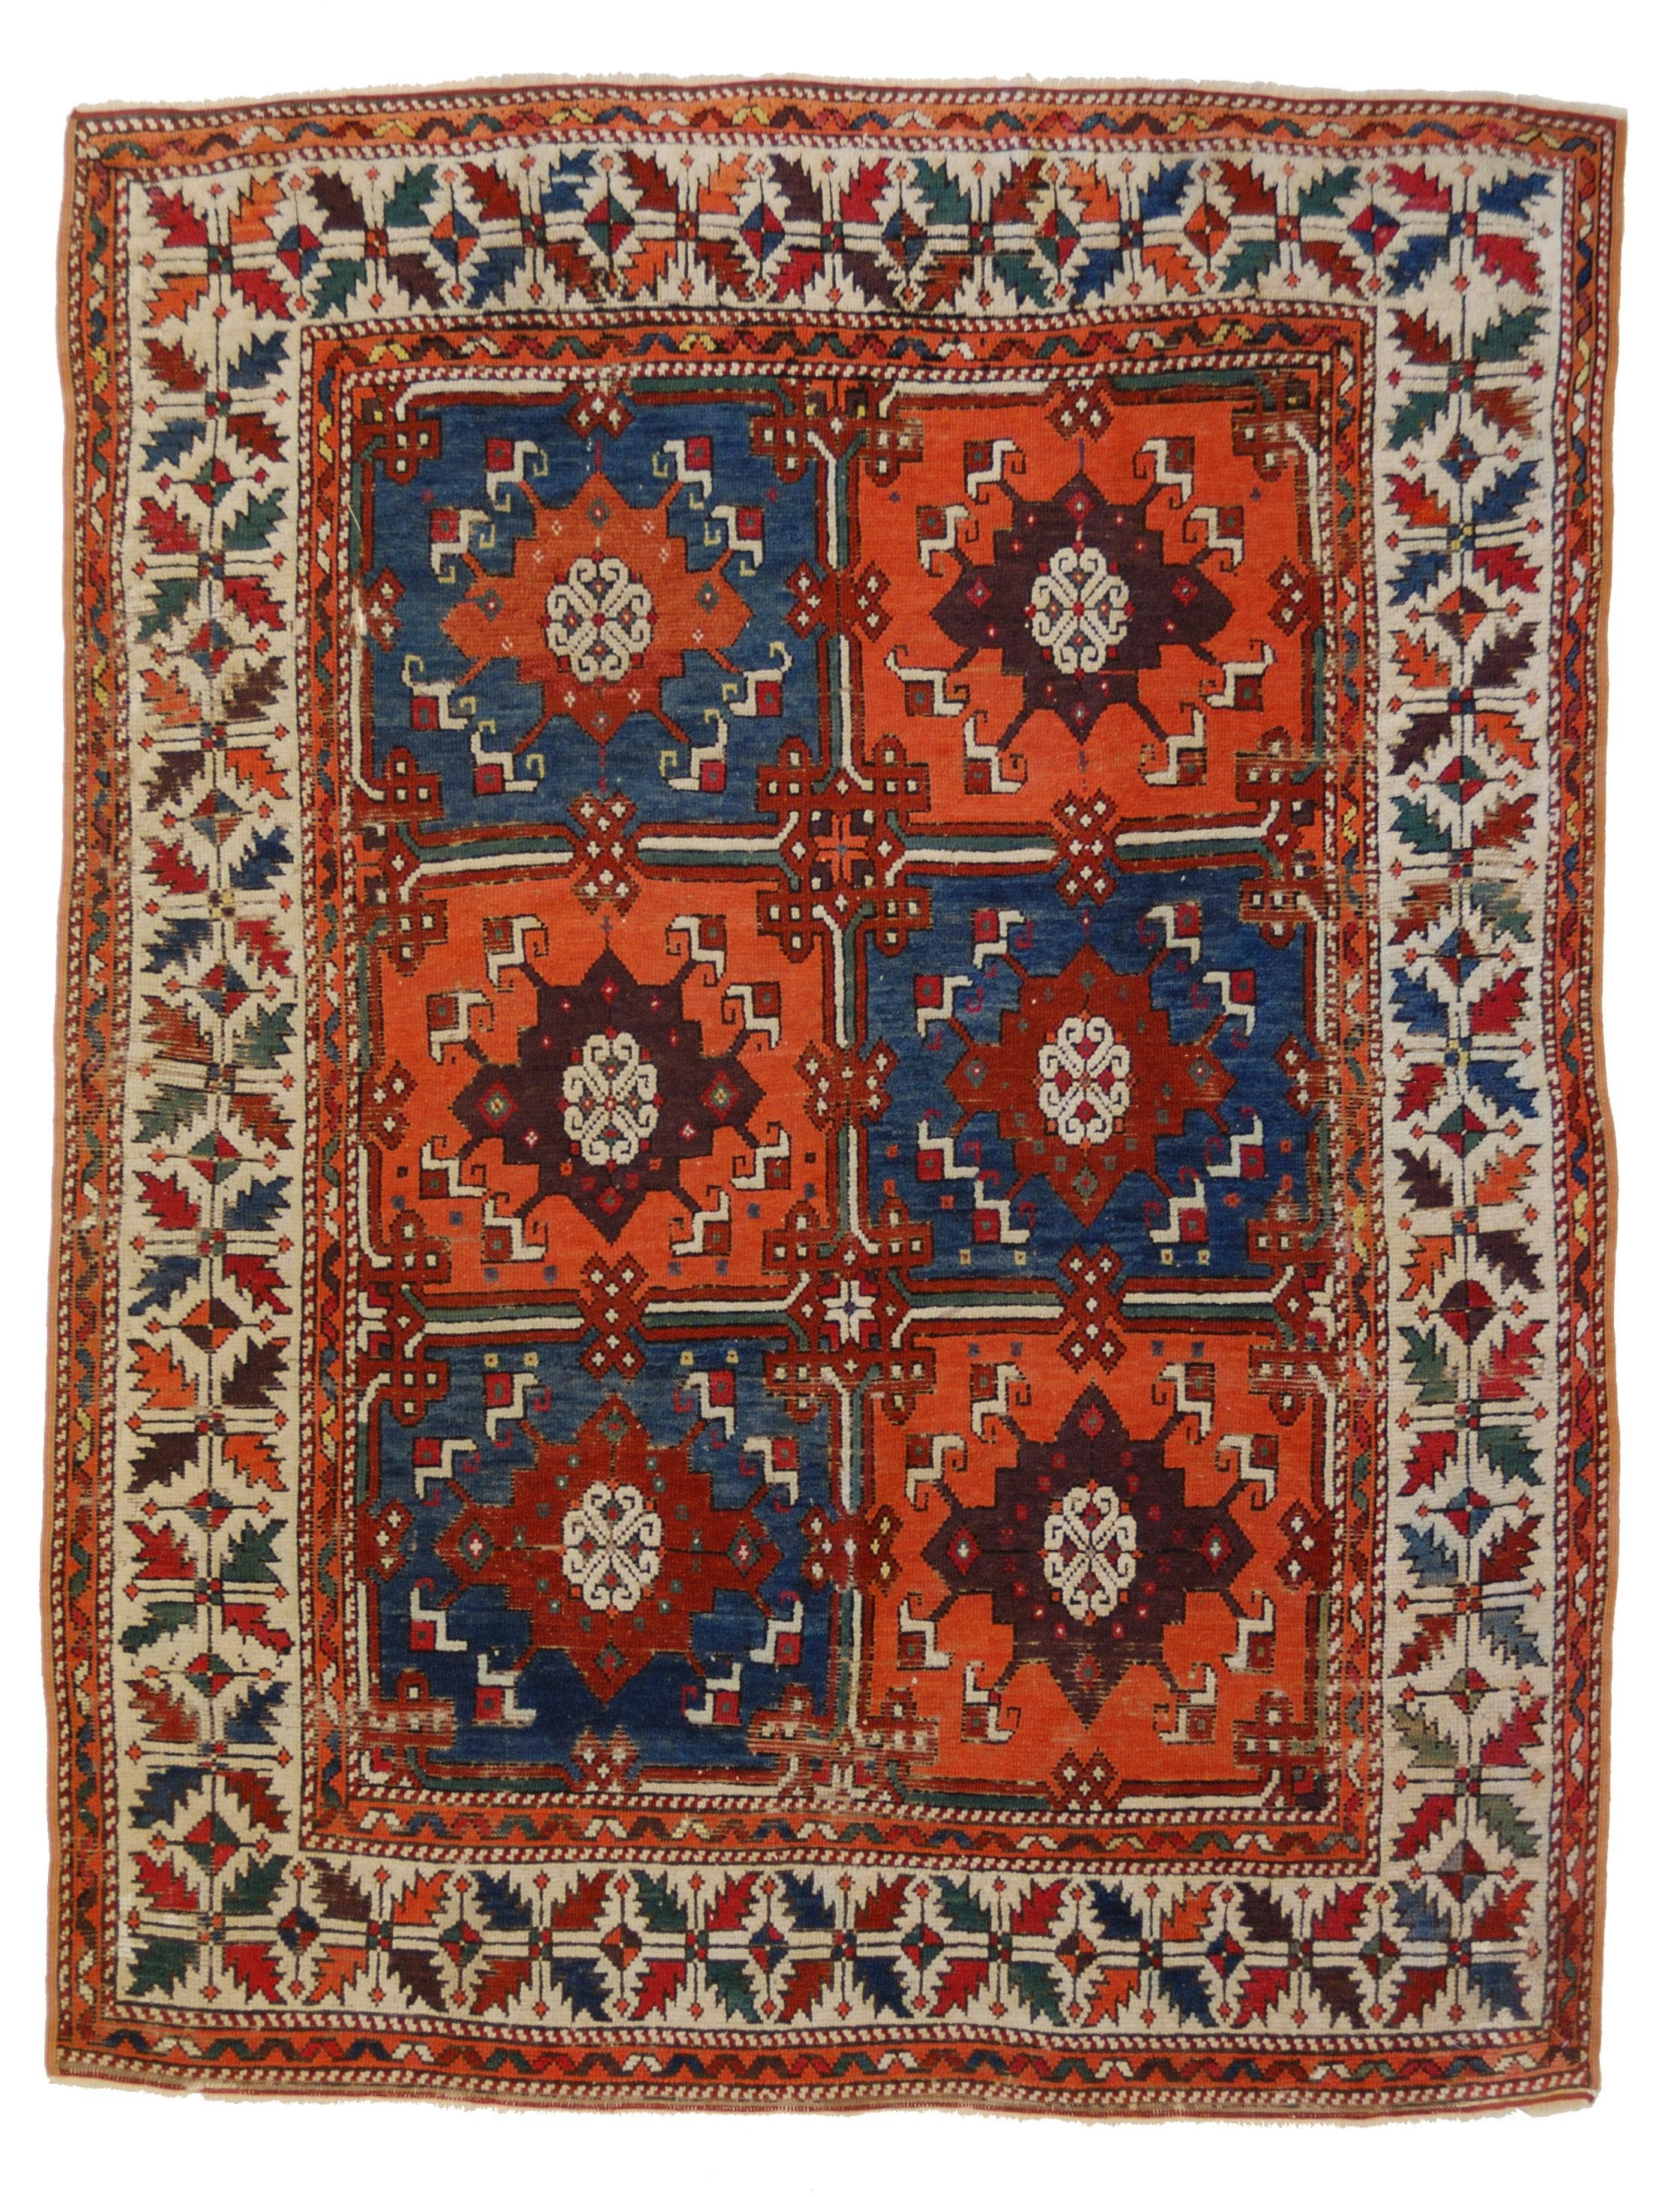 Tappeti anatolici antichi di morandi tappeti morandi - Tappeti orientali ...